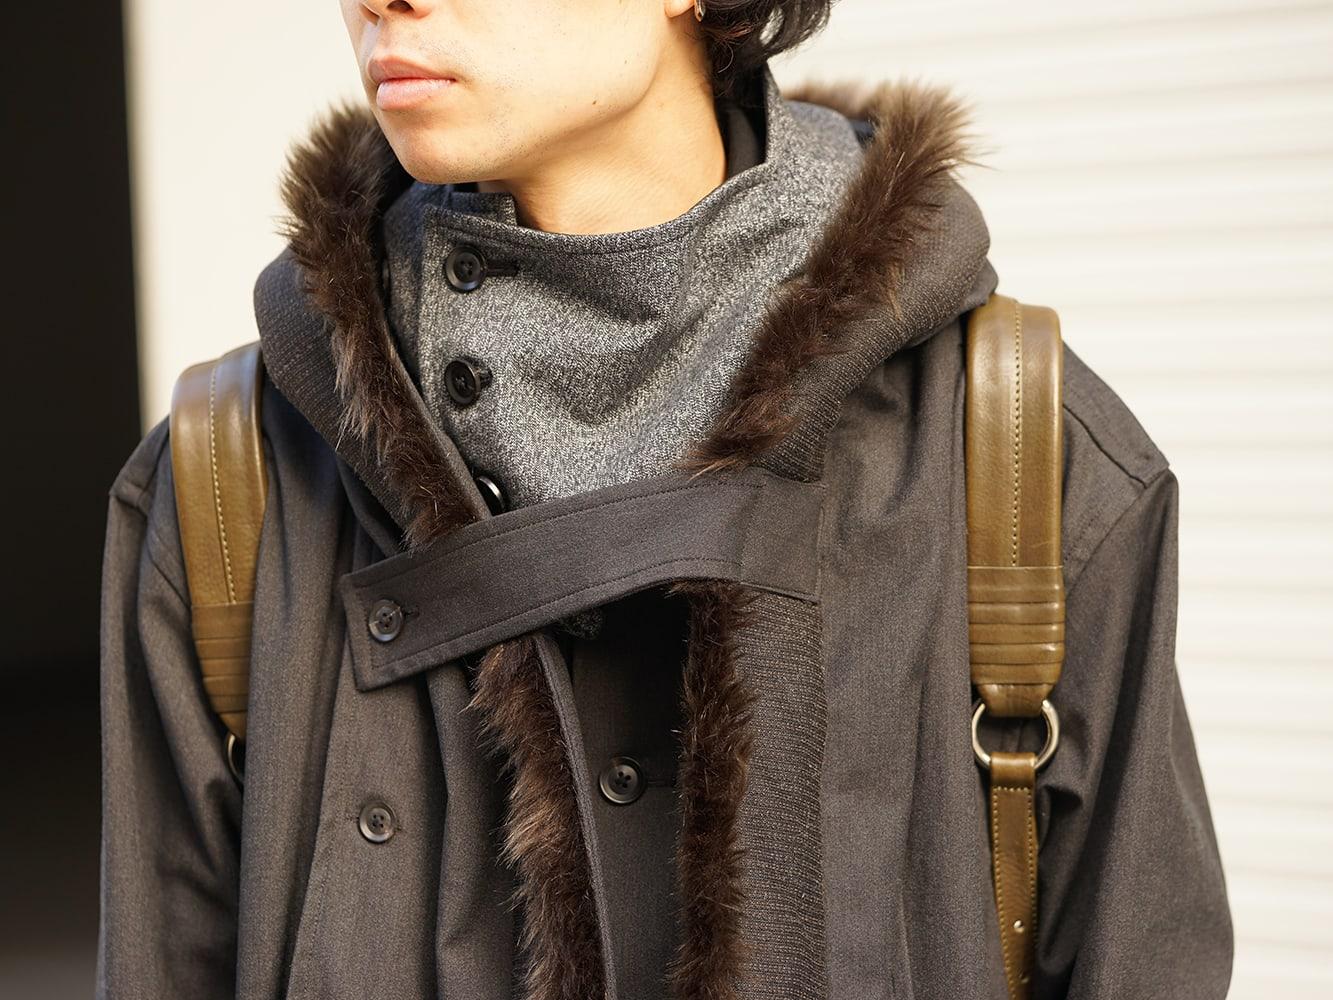 Yohji Yamamoto High-necked leather jacket Style 05